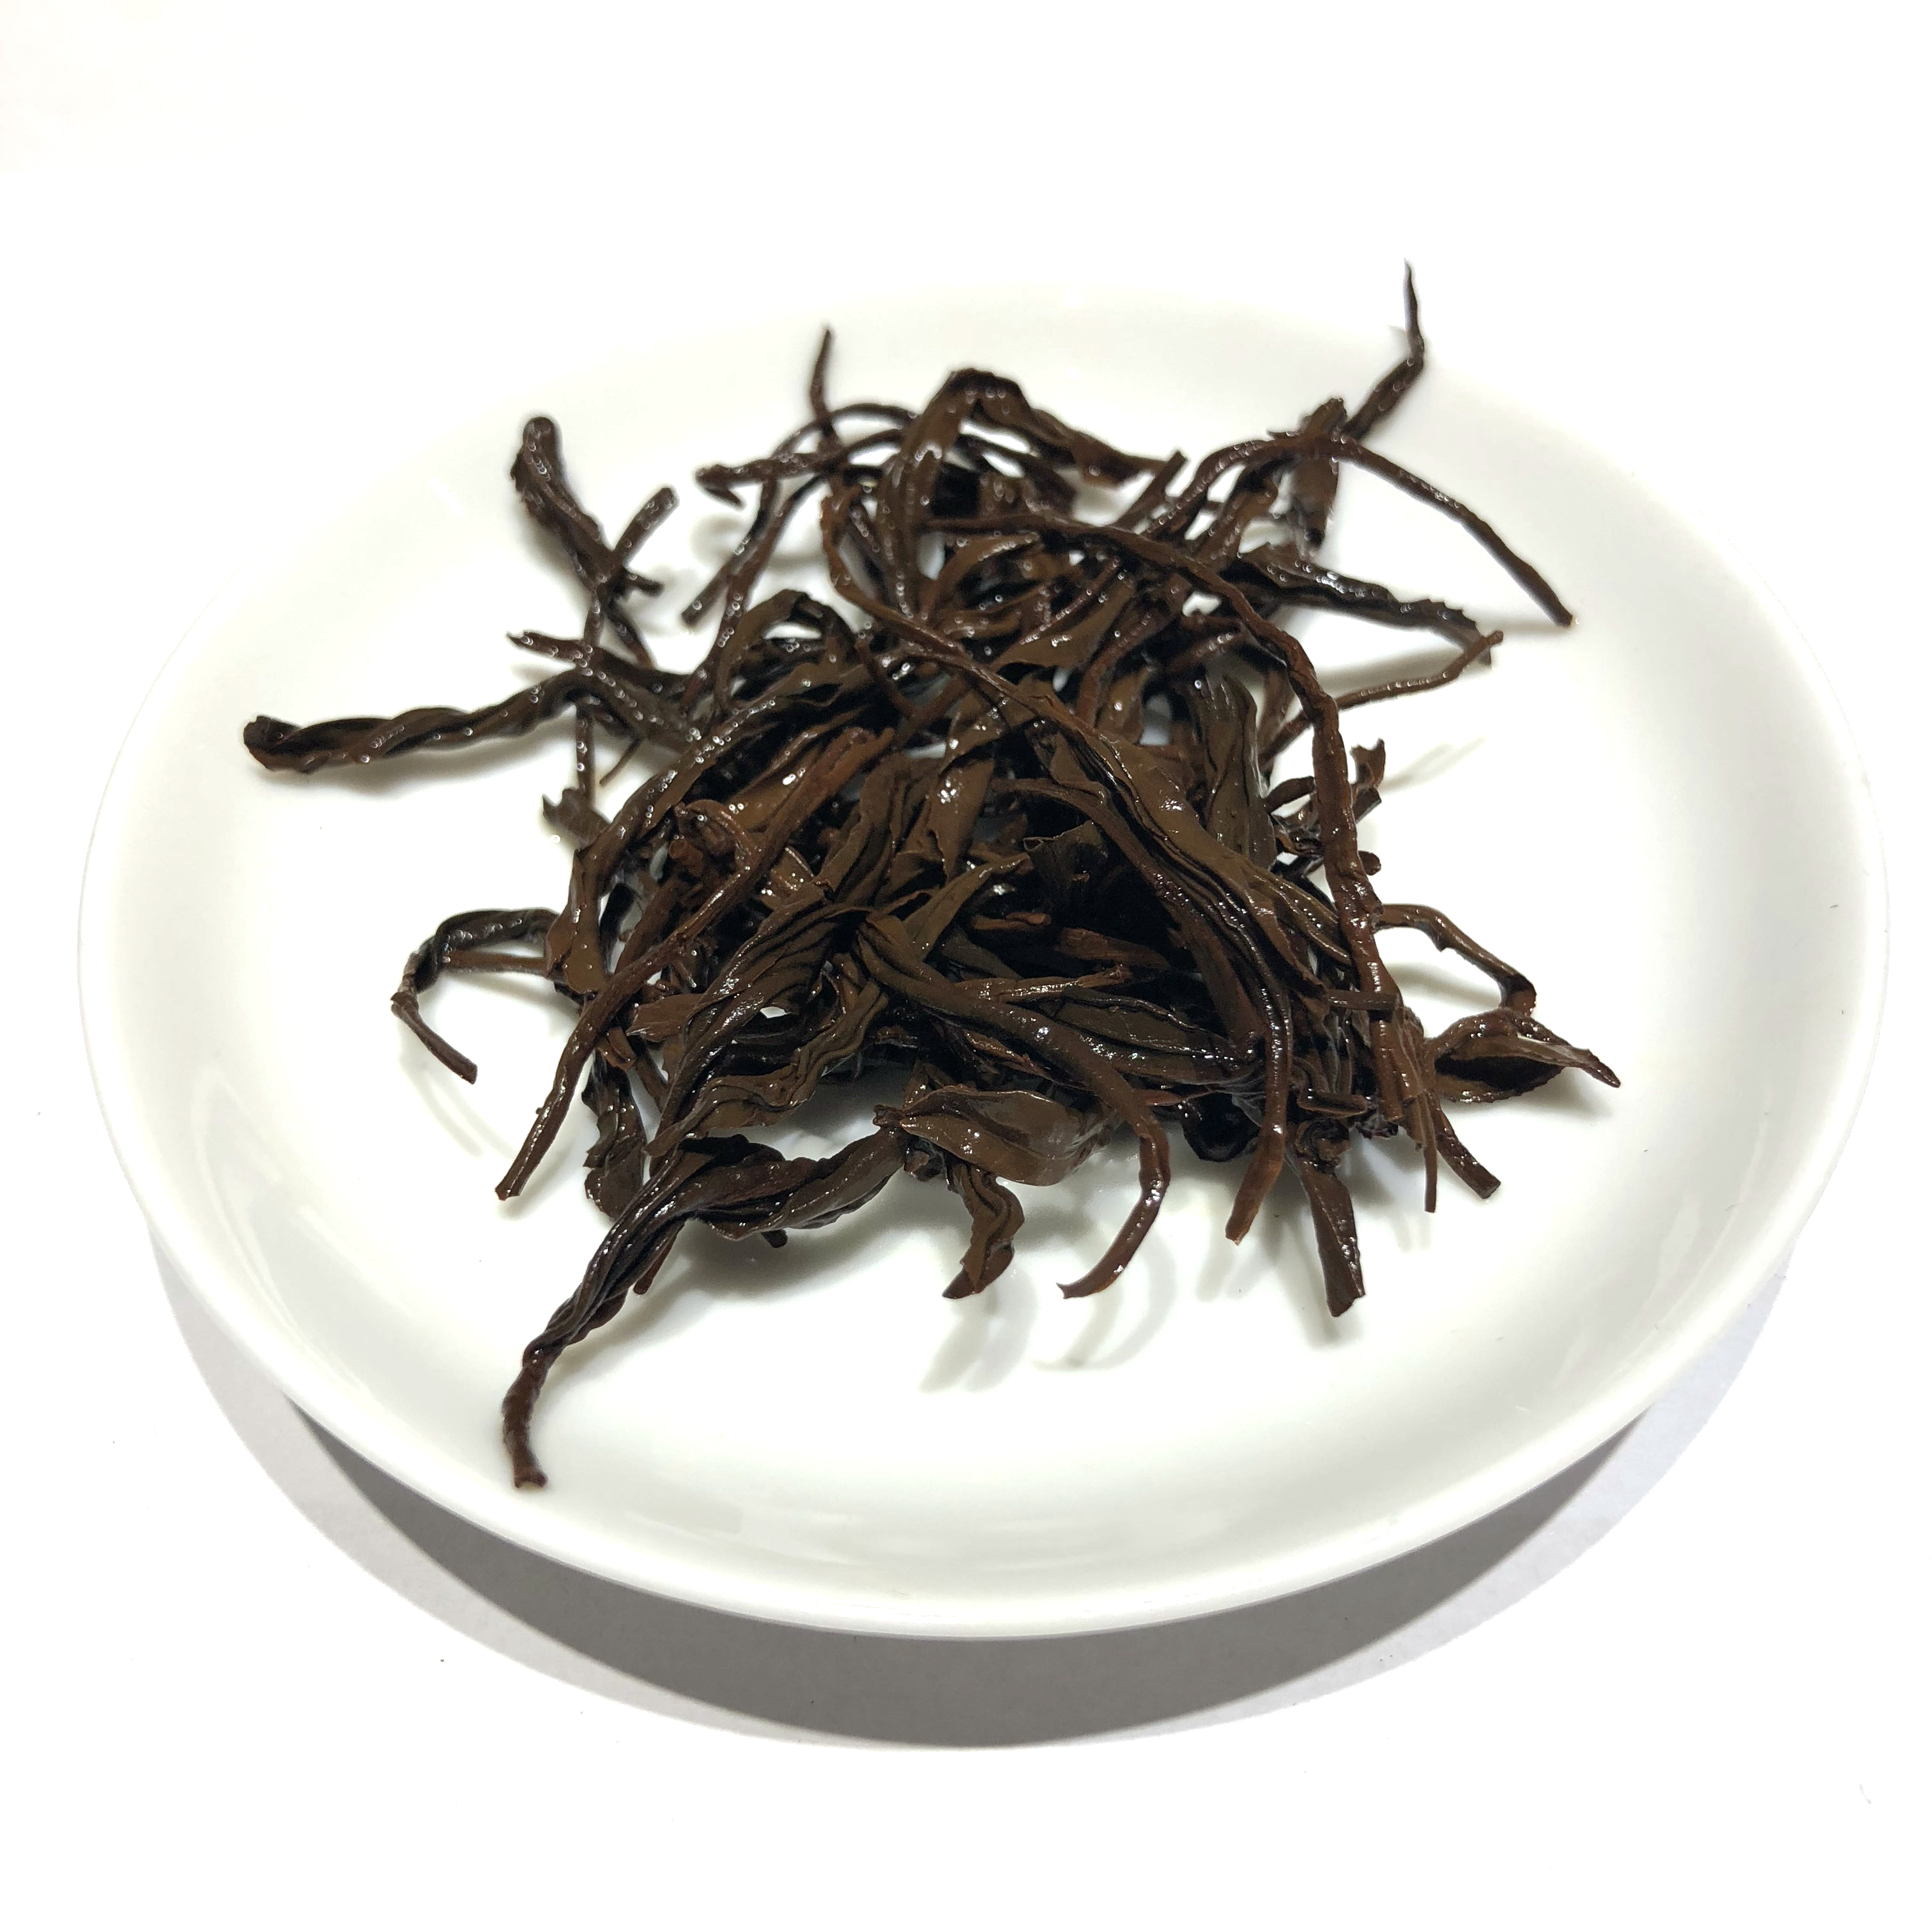 Fine quality organic low price black tea loose - 4uTea   4uTea.com